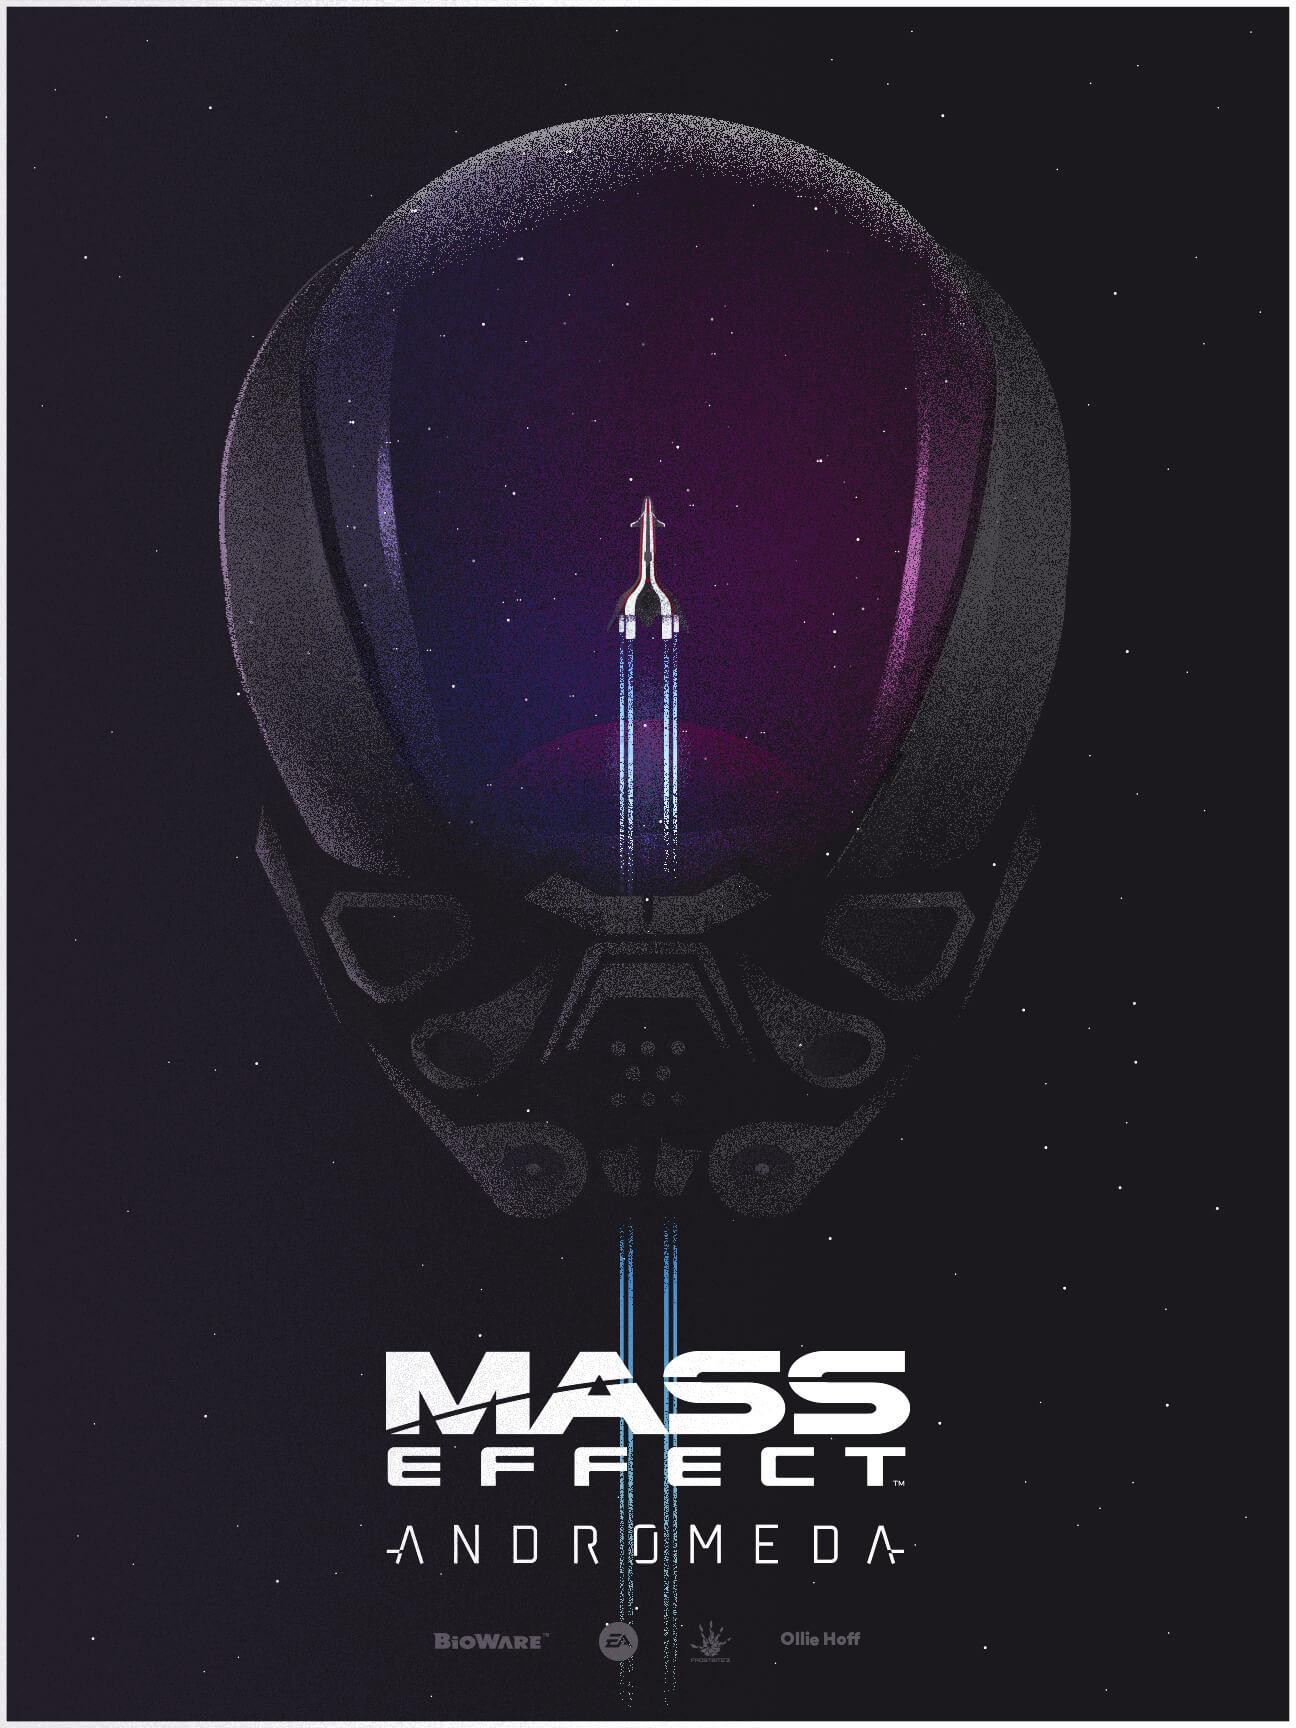 Wallpaper Mass Effect Andromeda Bioware Tempest Ea Games